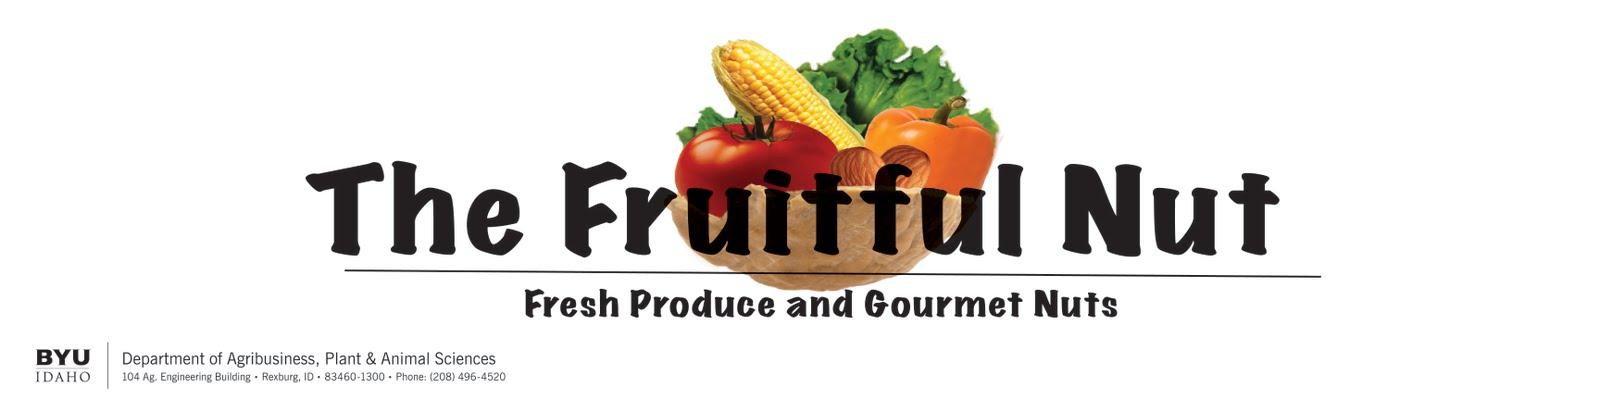 The Fruitful Nut